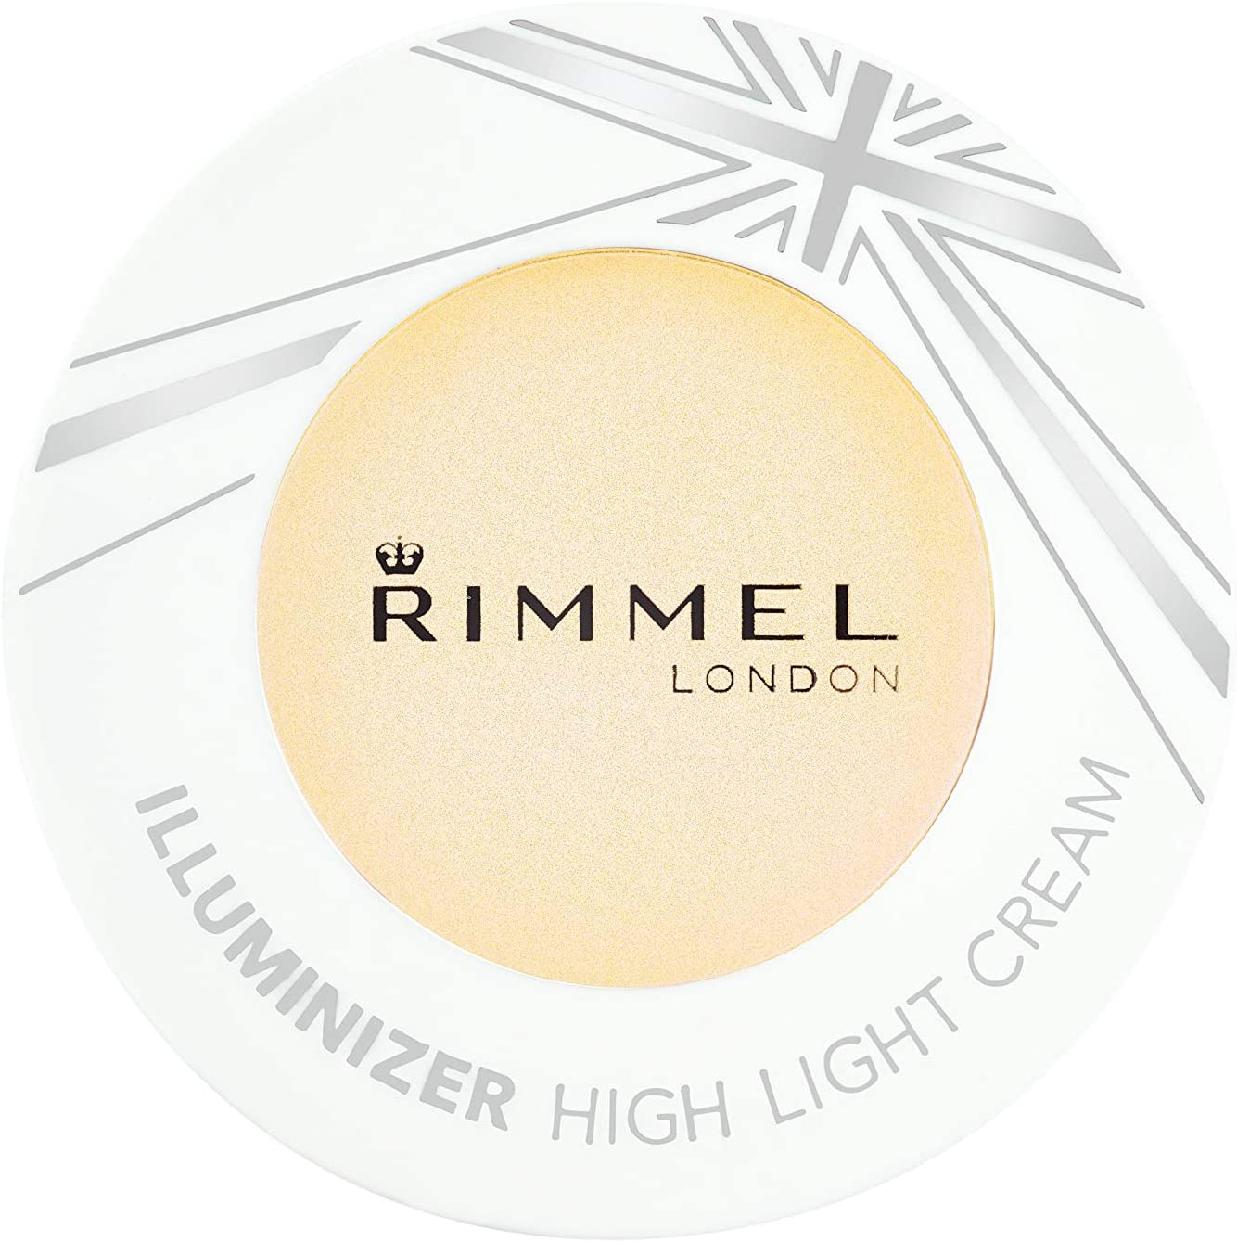 Rimmel(リンメル) イルミナイザーの商品画像7